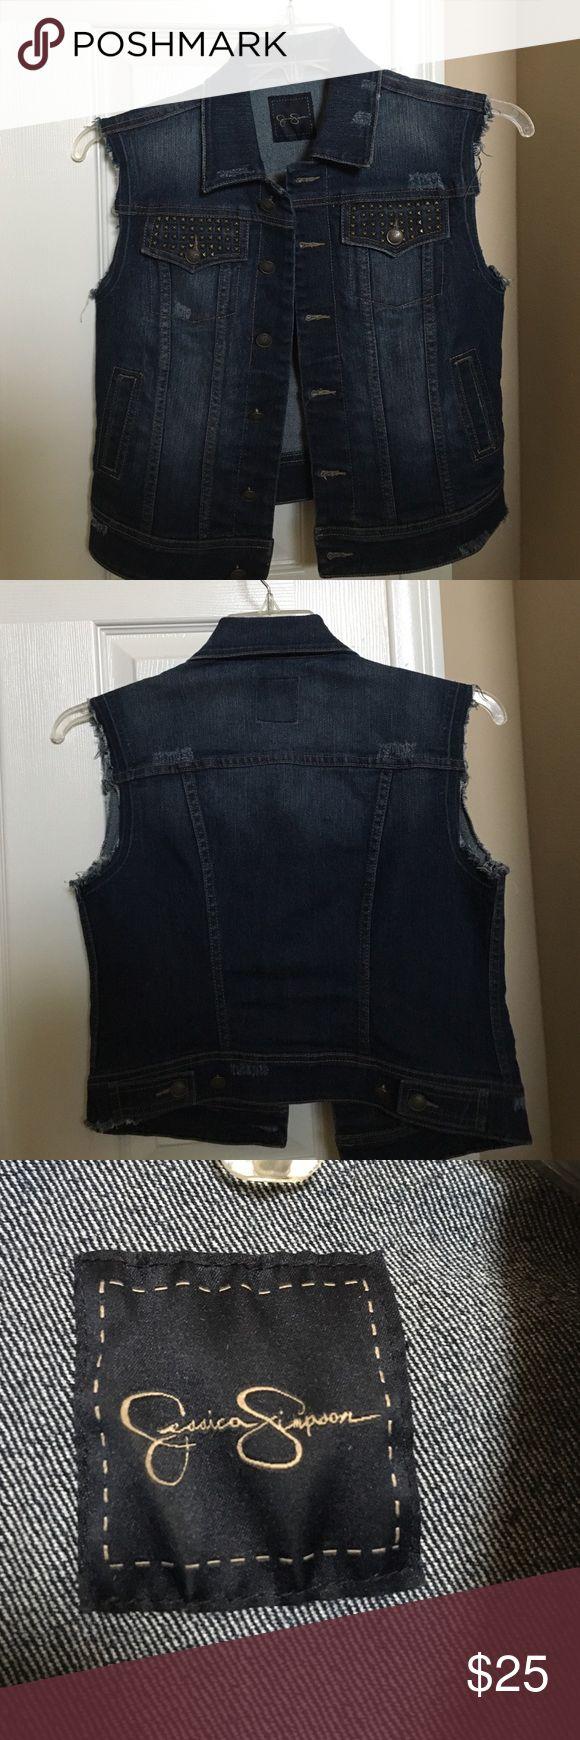 Jessica Simpson Denim Vest with studded pockets Blue denim vest Jessica Simpson Jessica Simpson Jackets & Coats Vests